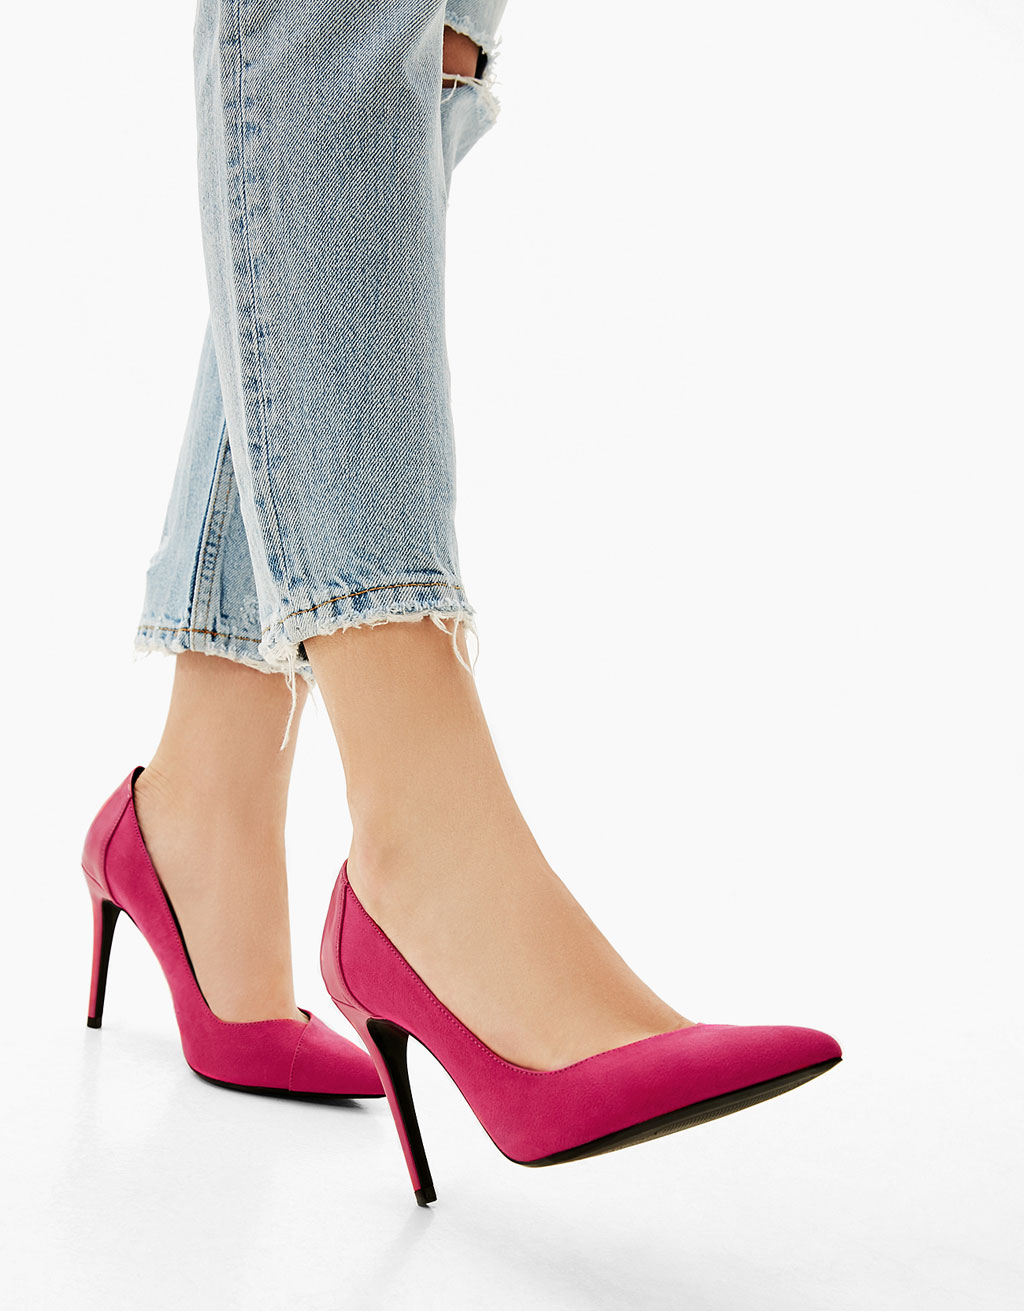 Contrast stiletto heel shoes